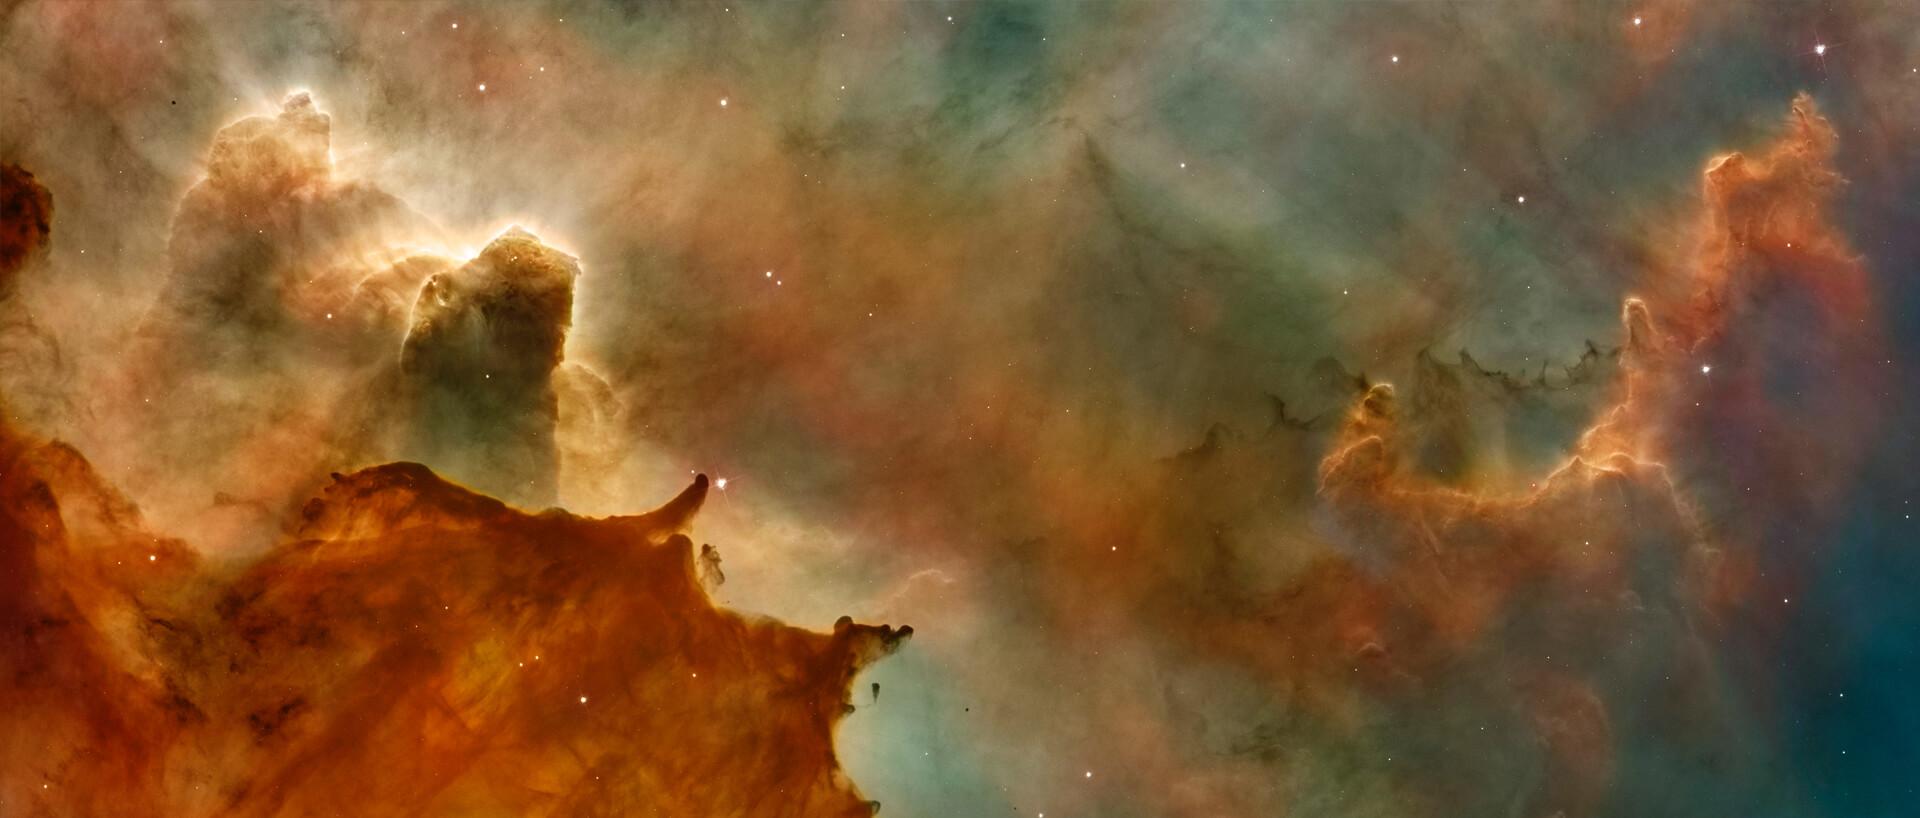 panorama photo of the galaxy